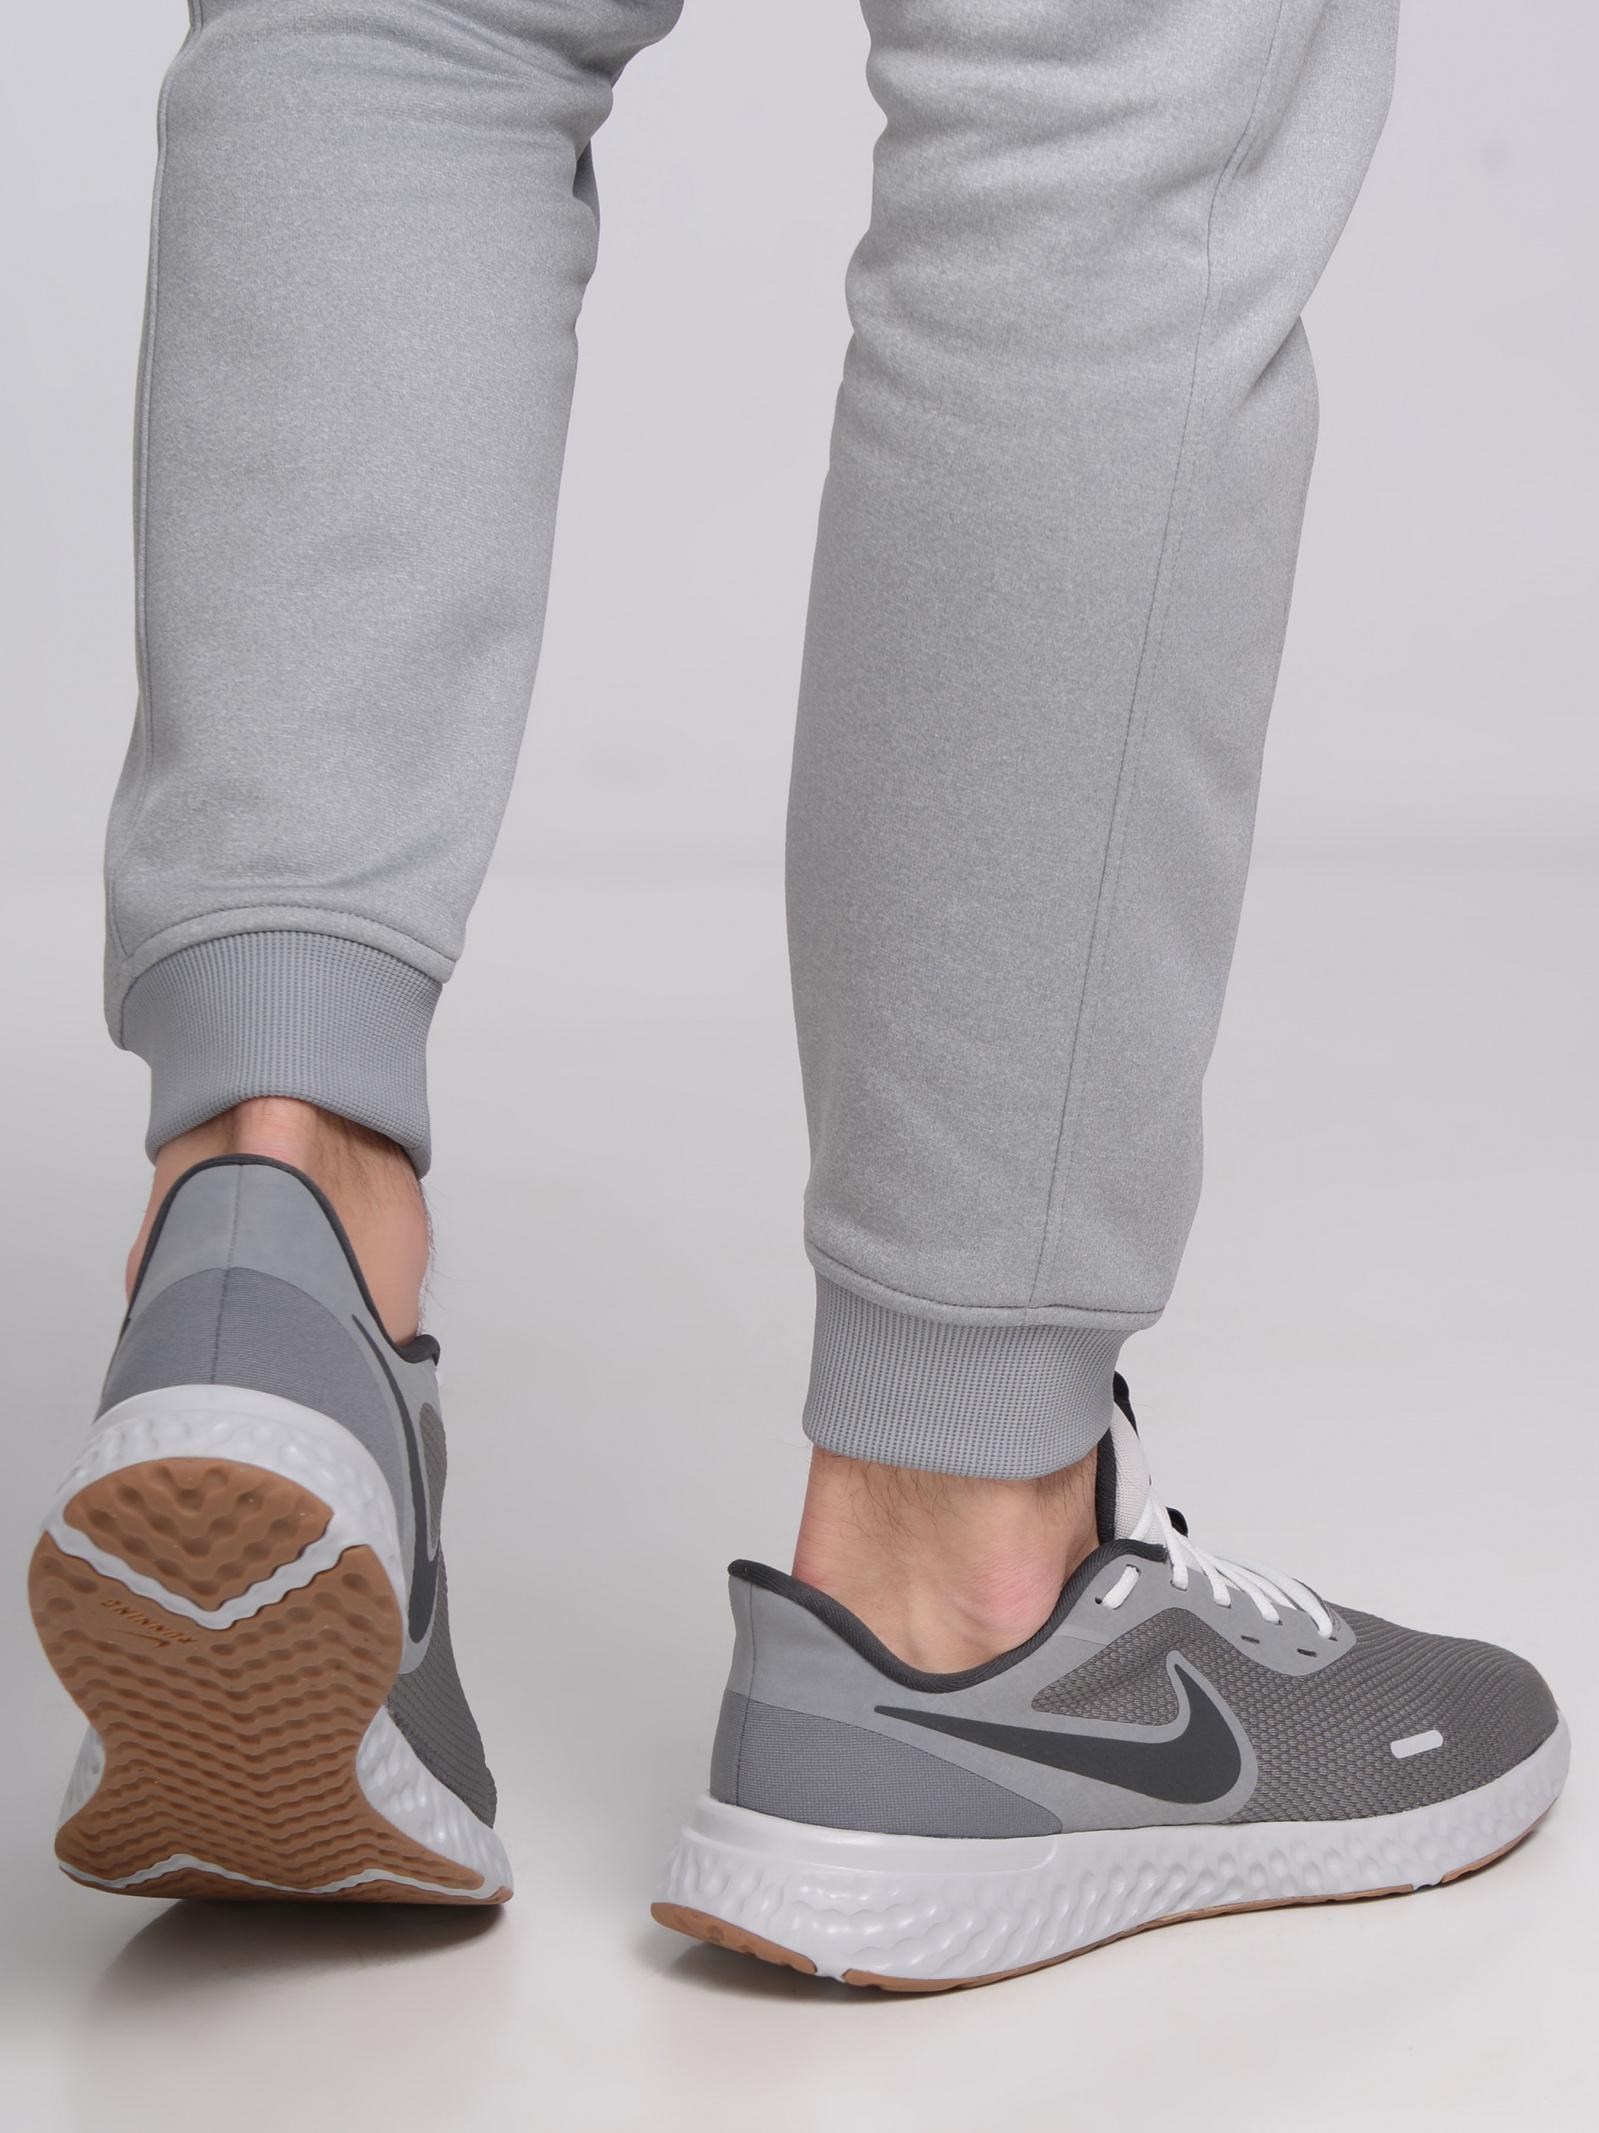 Кроссовки для мужчин NIKE Nike Revolution 5 BQ3204-008 размерная сетка обуви, 2017